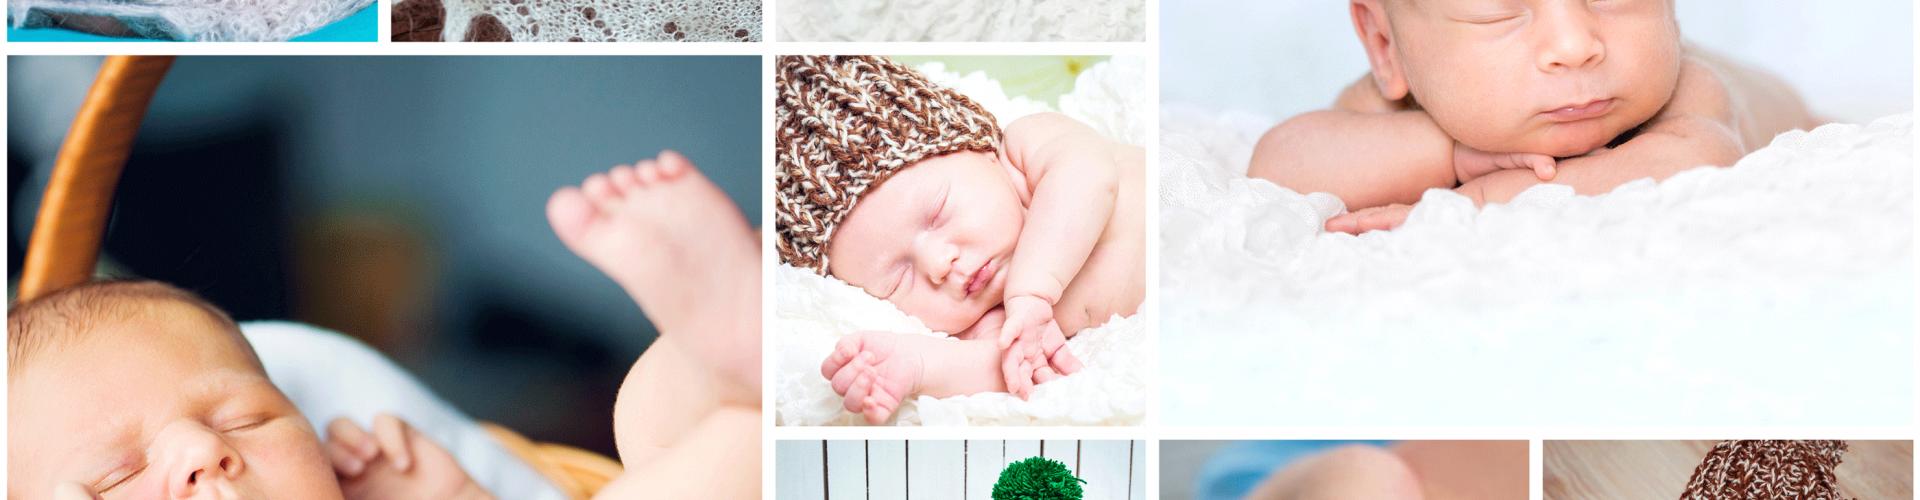 IVI ya ha traído al mundo 125.000 bebés